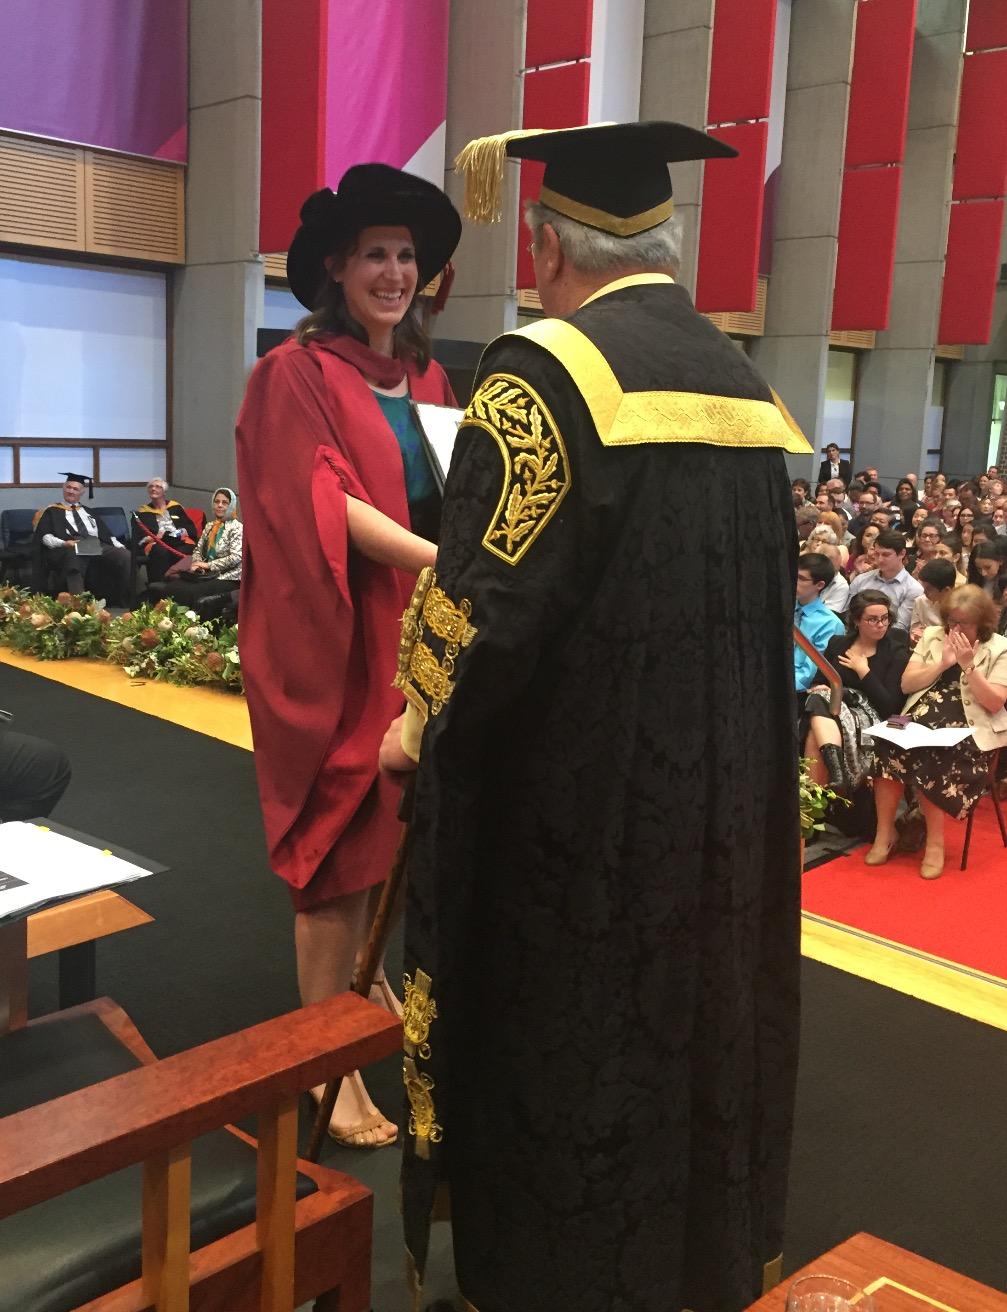 Graduation at Macquarie University